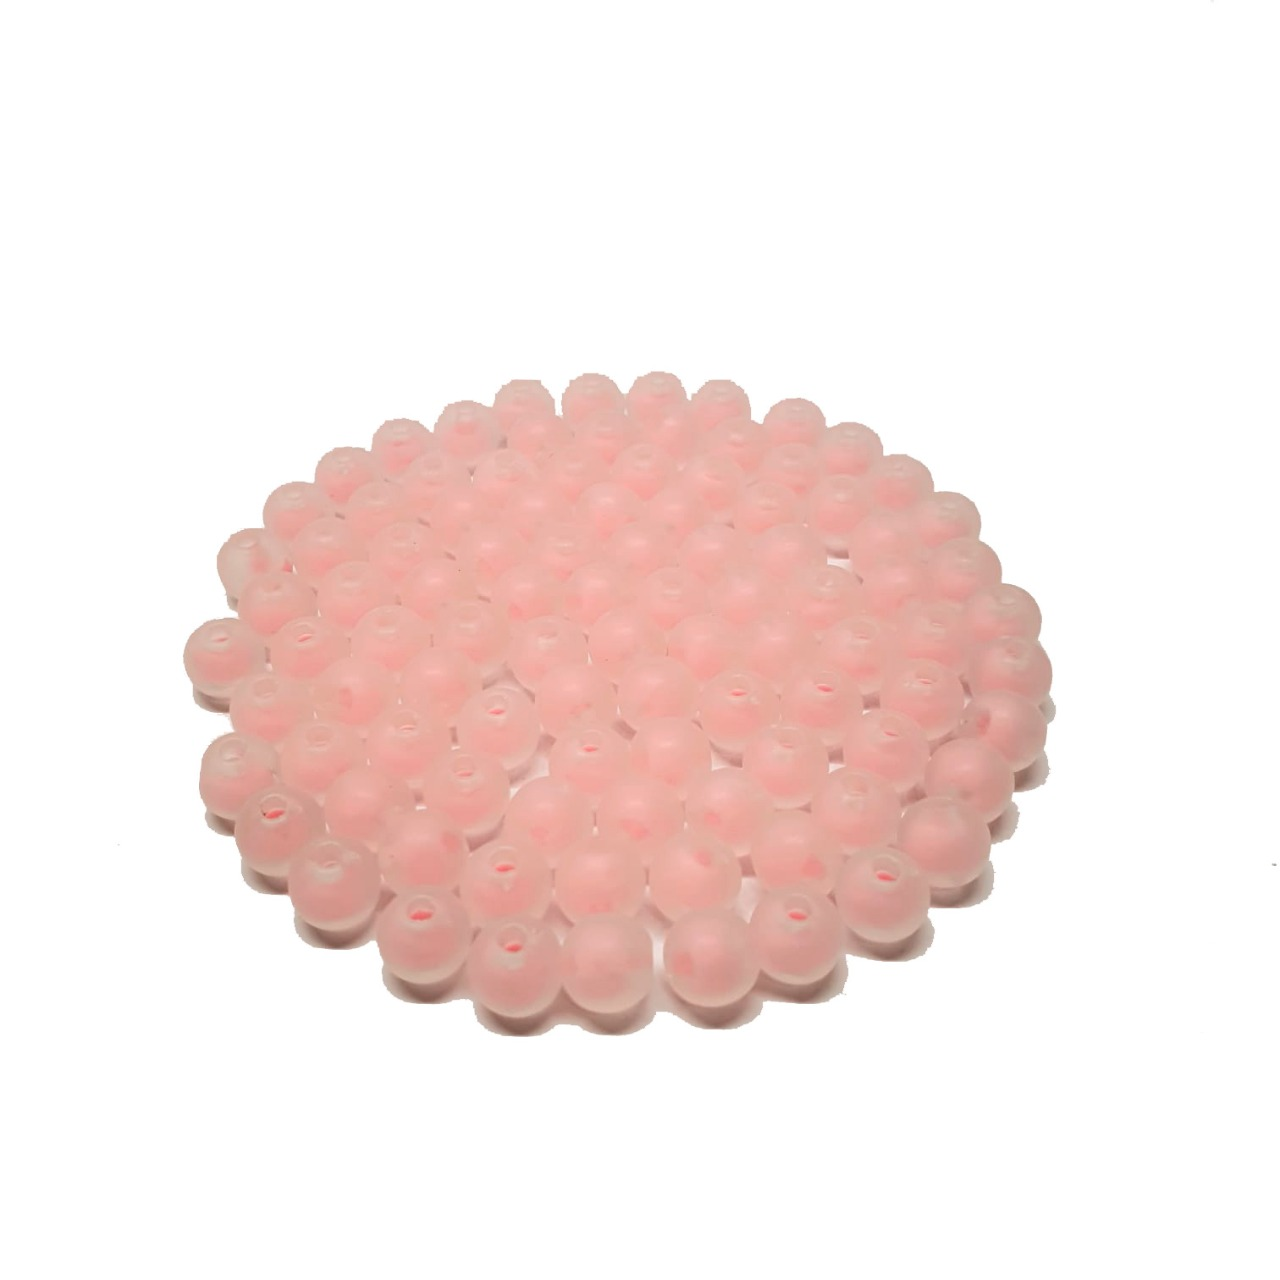 Bola de Plástico Fosca com Miolo Rosa